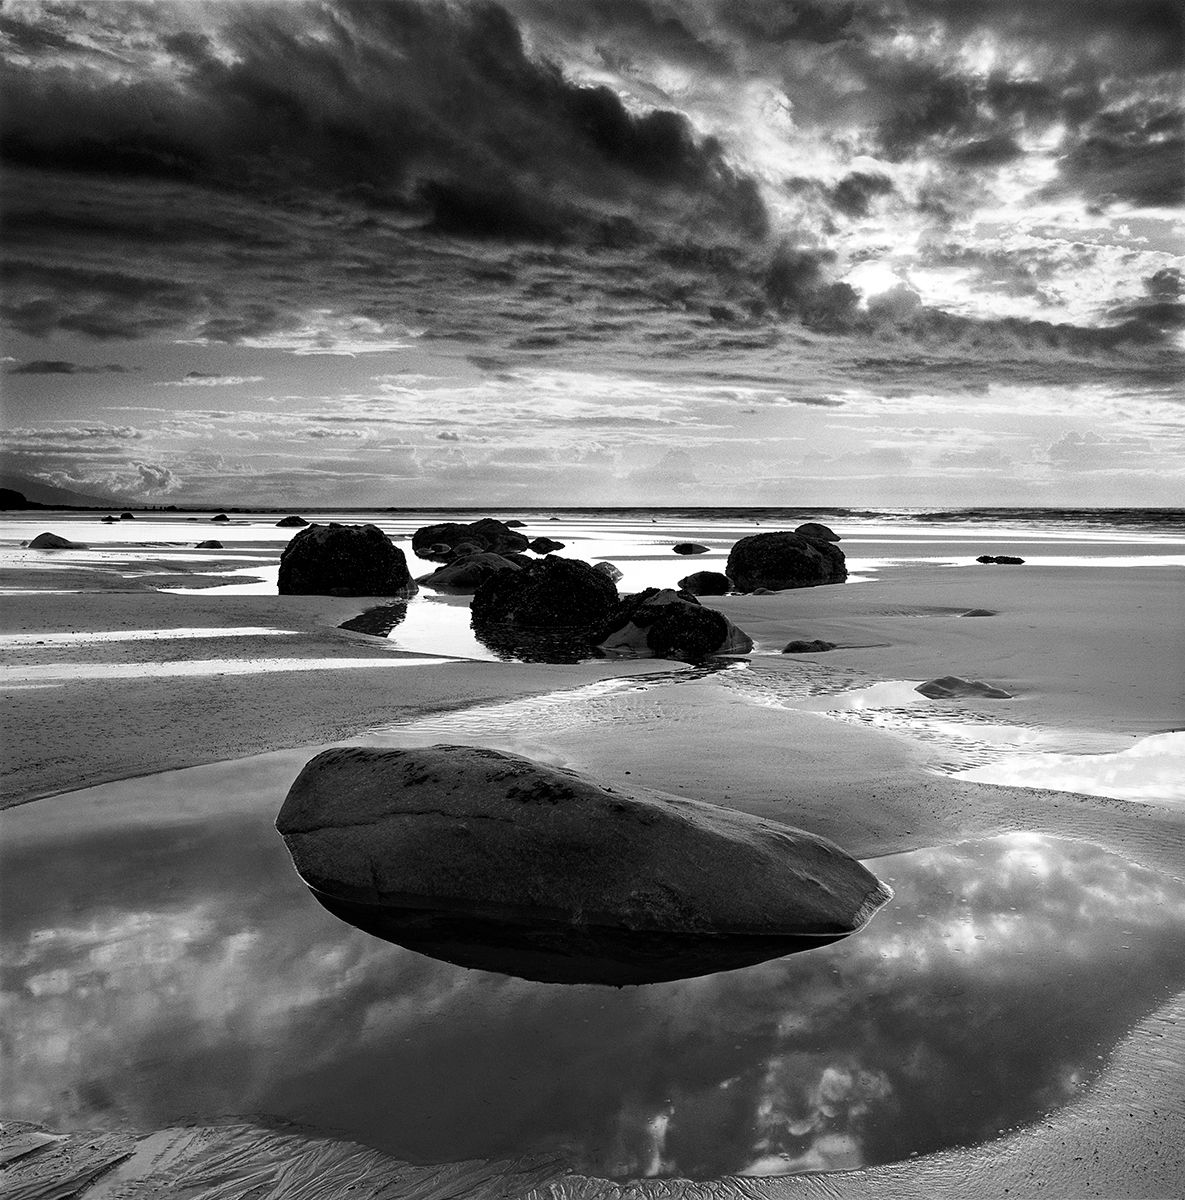 Storm Clouds 3048dpi Flat   copy.jpg